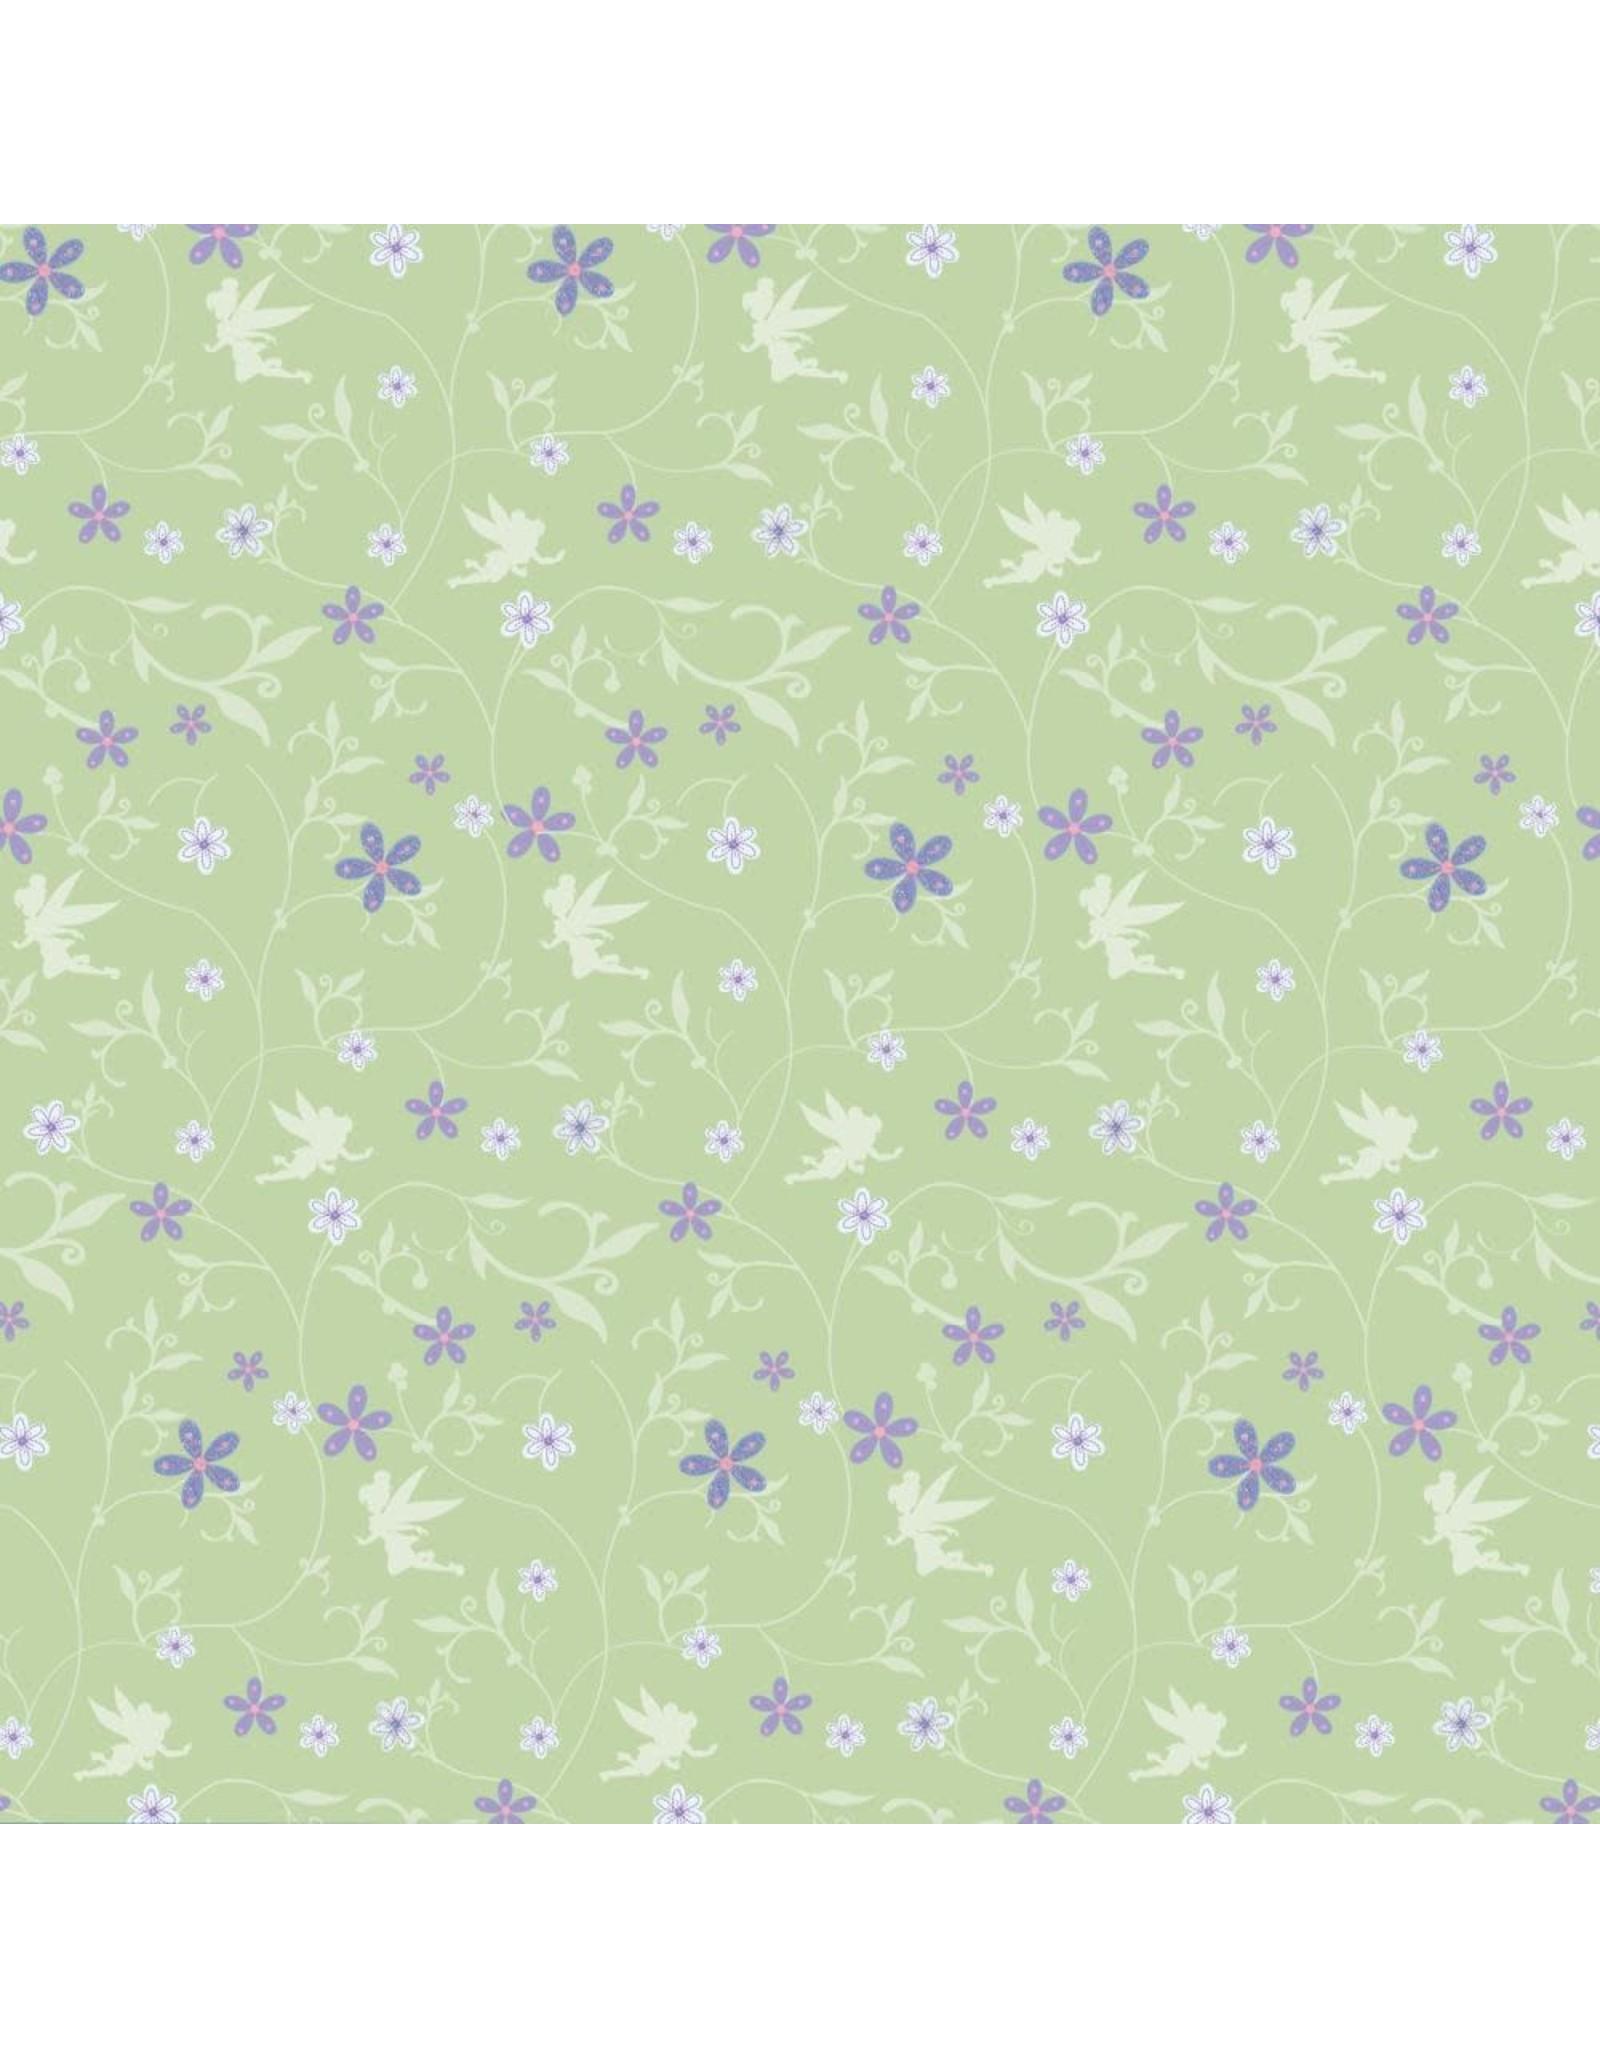 Disney Tinkerbell Flower Glitter 12x12